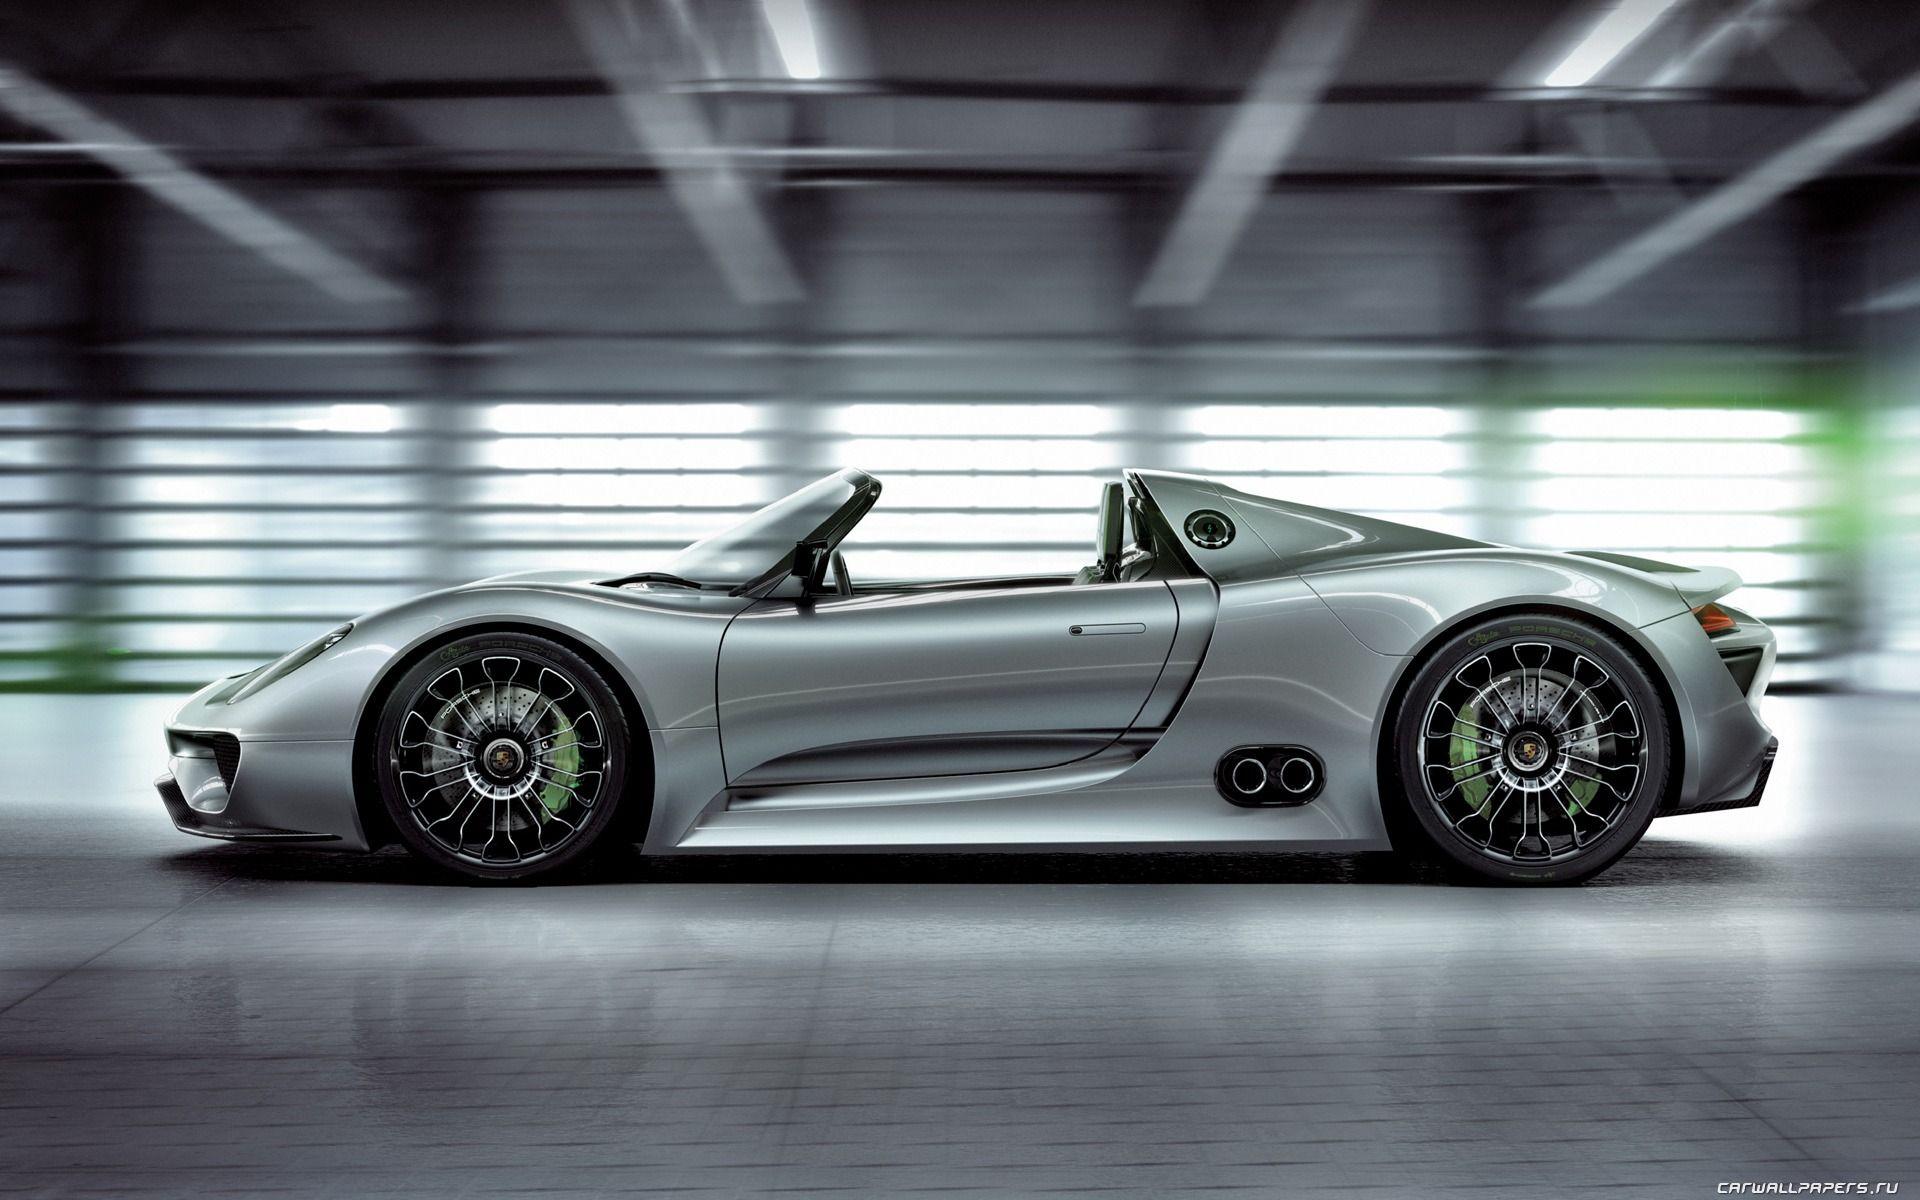 Porsche Turbo S Spyder x All For Desktop